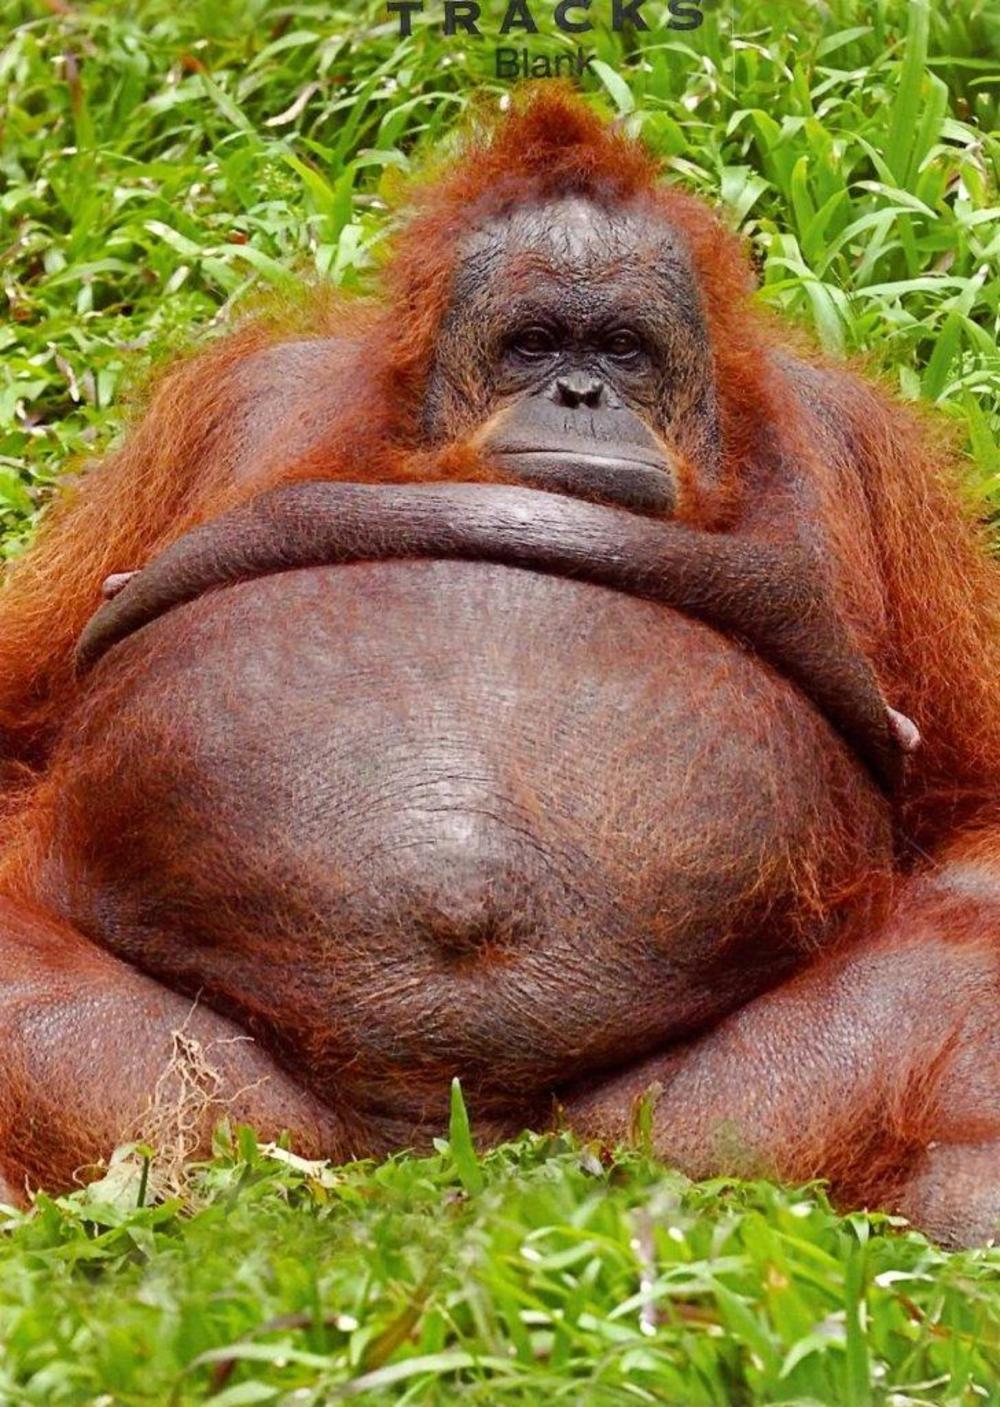 Orangutan Blank Photo Greeting Card